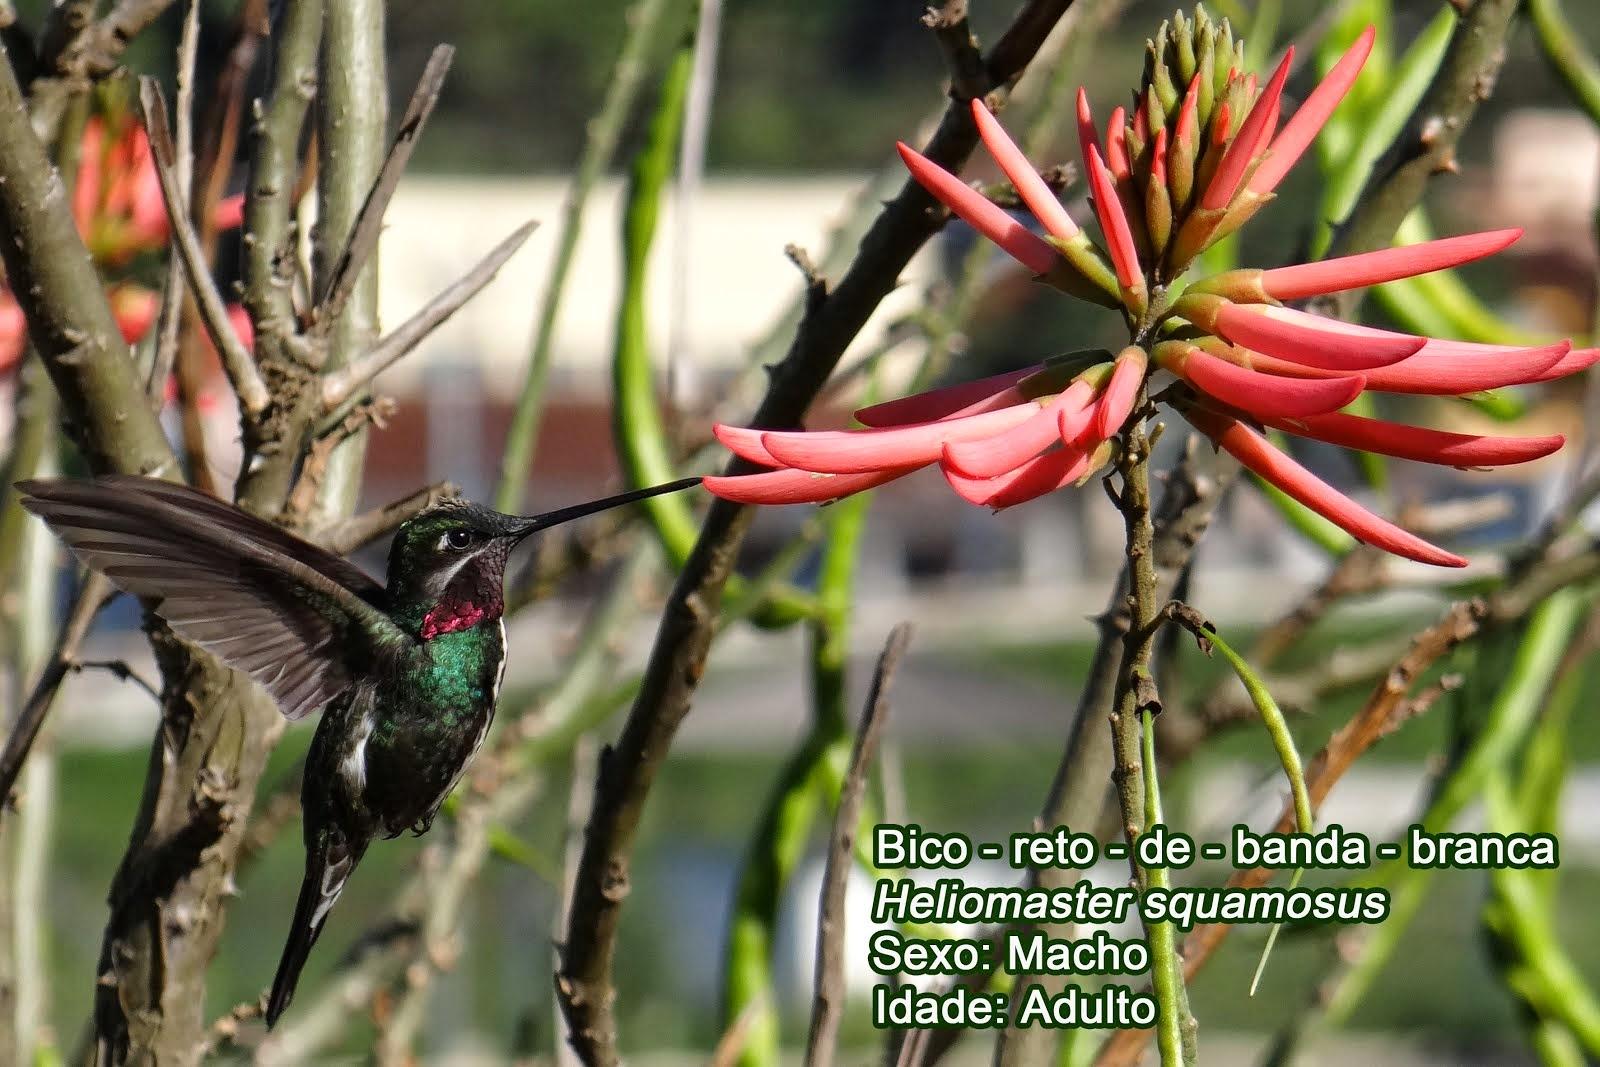 Beija-flores de Arceburgo - Numero 9